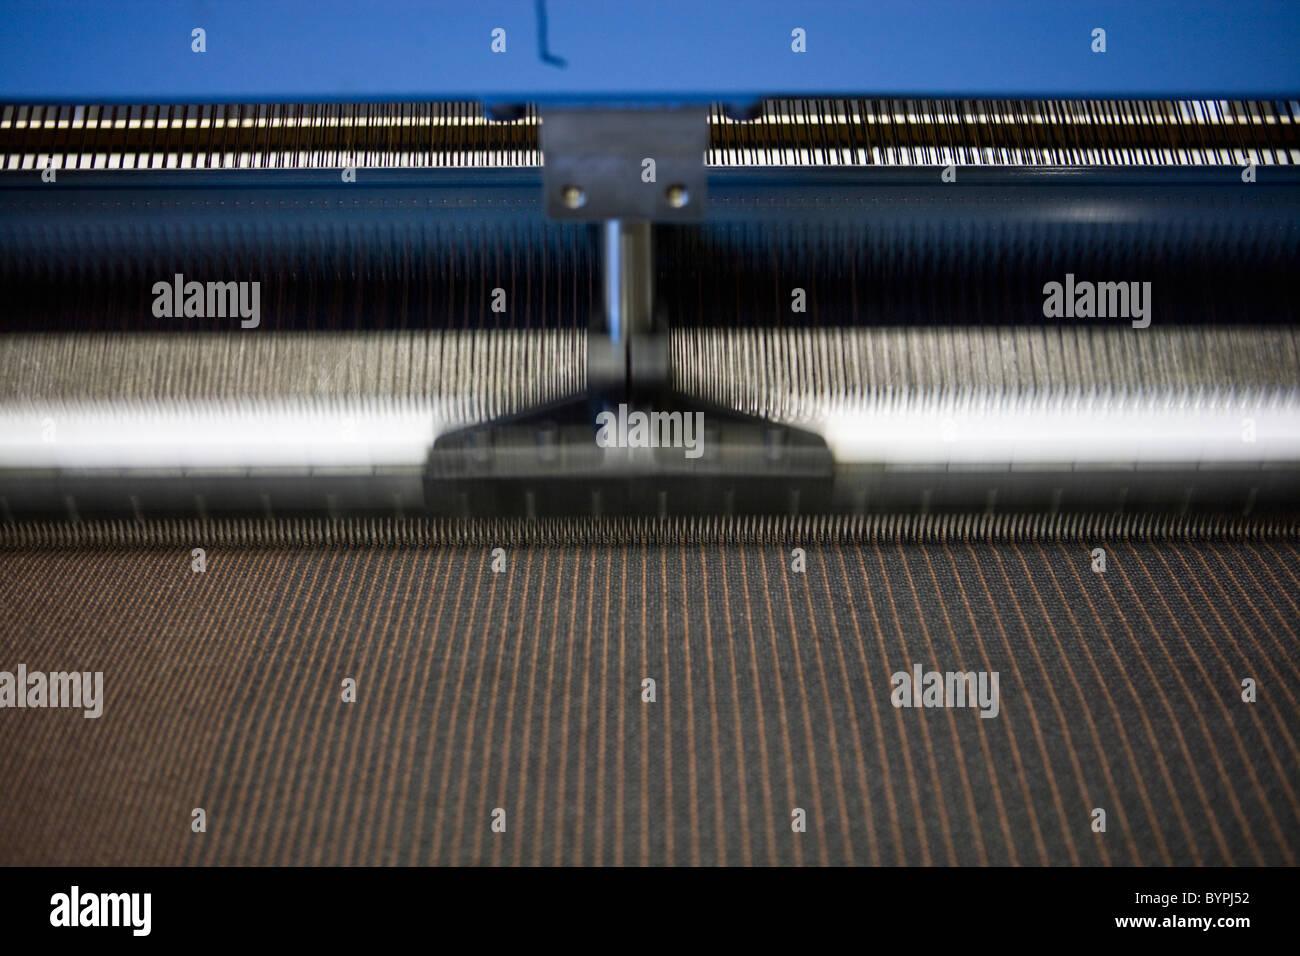 Loom weaving carpet in carpet tile factory - Stock Image